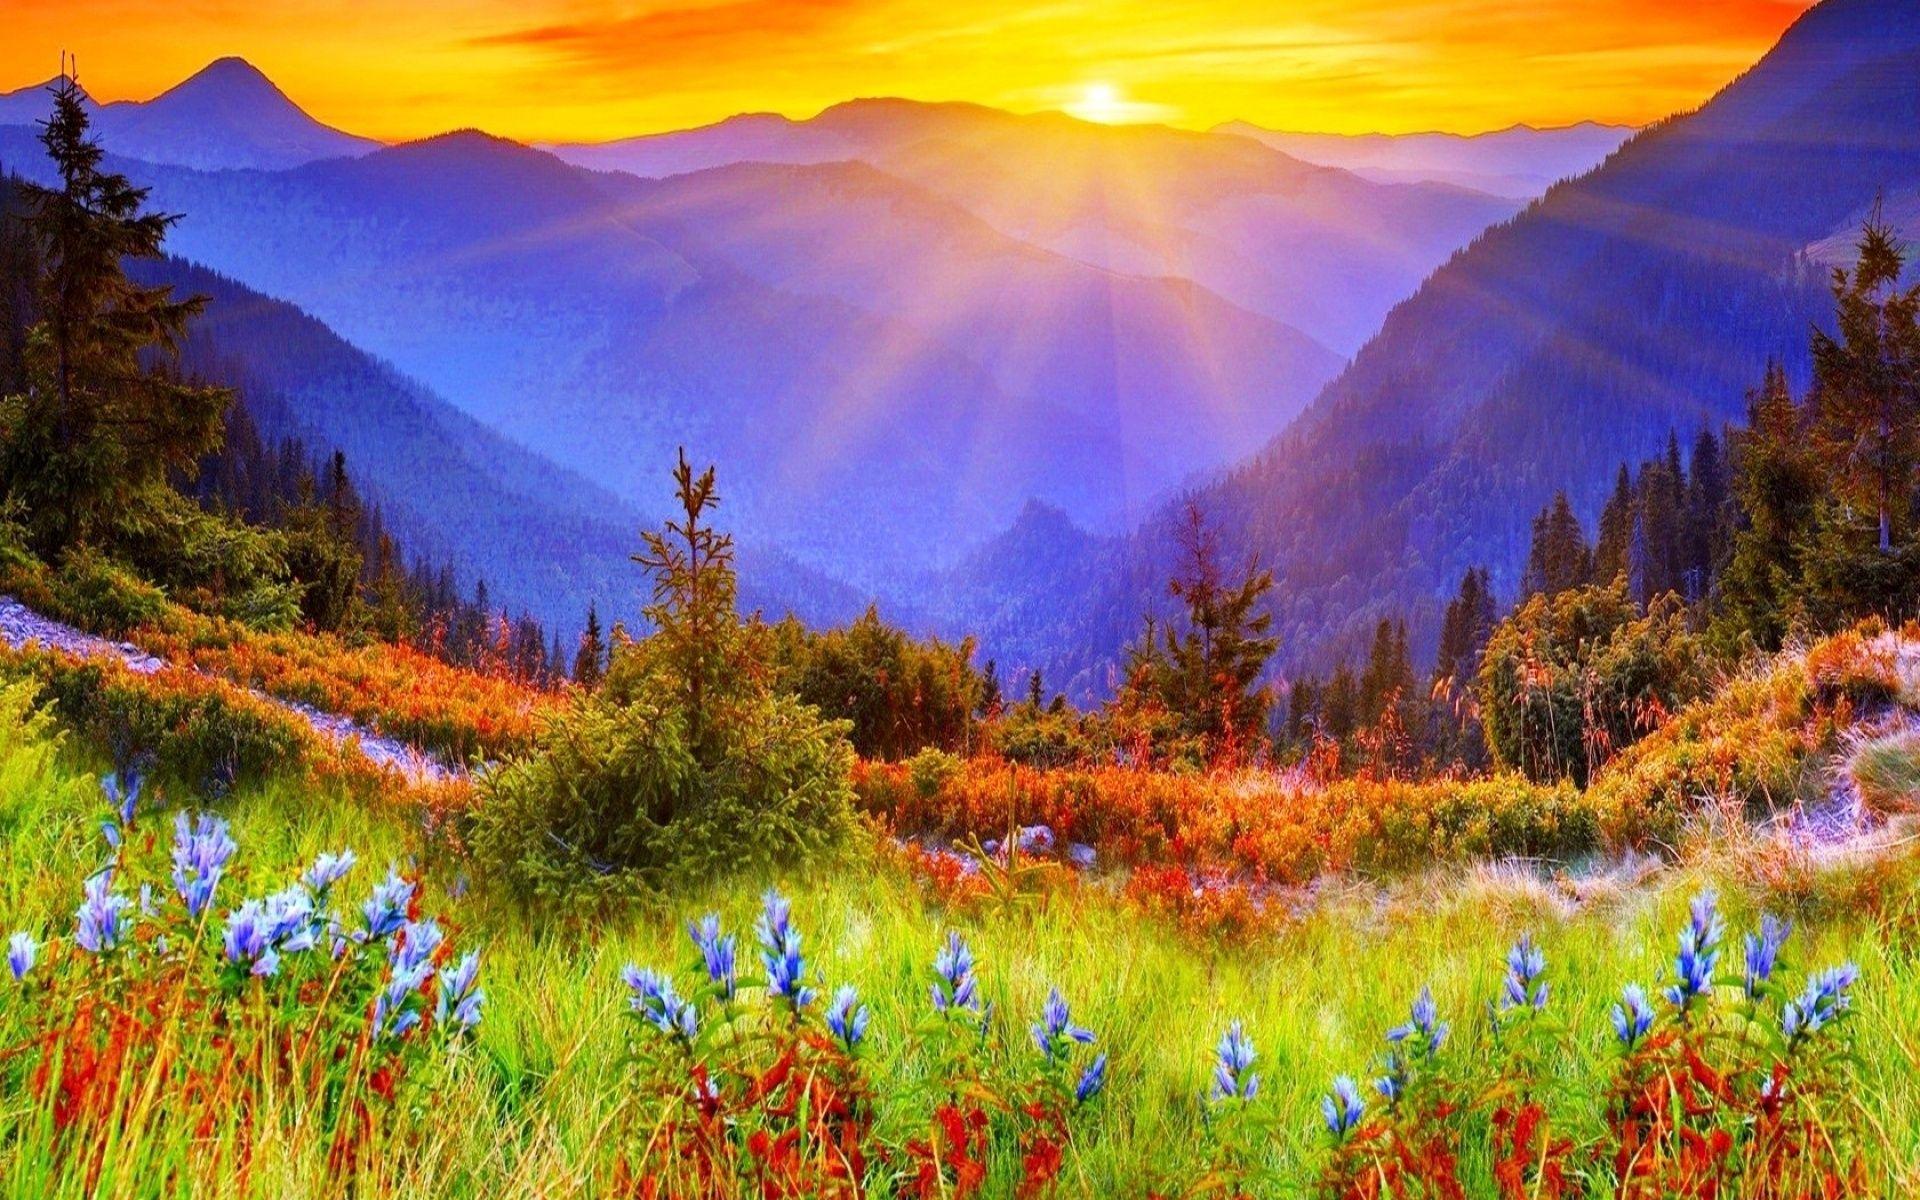 Mountain Sunrise Beautiful Landscape Wallpaper Hd Wallpapers Mountain Landscape Sunrise Photos Sunrise Wallpaper